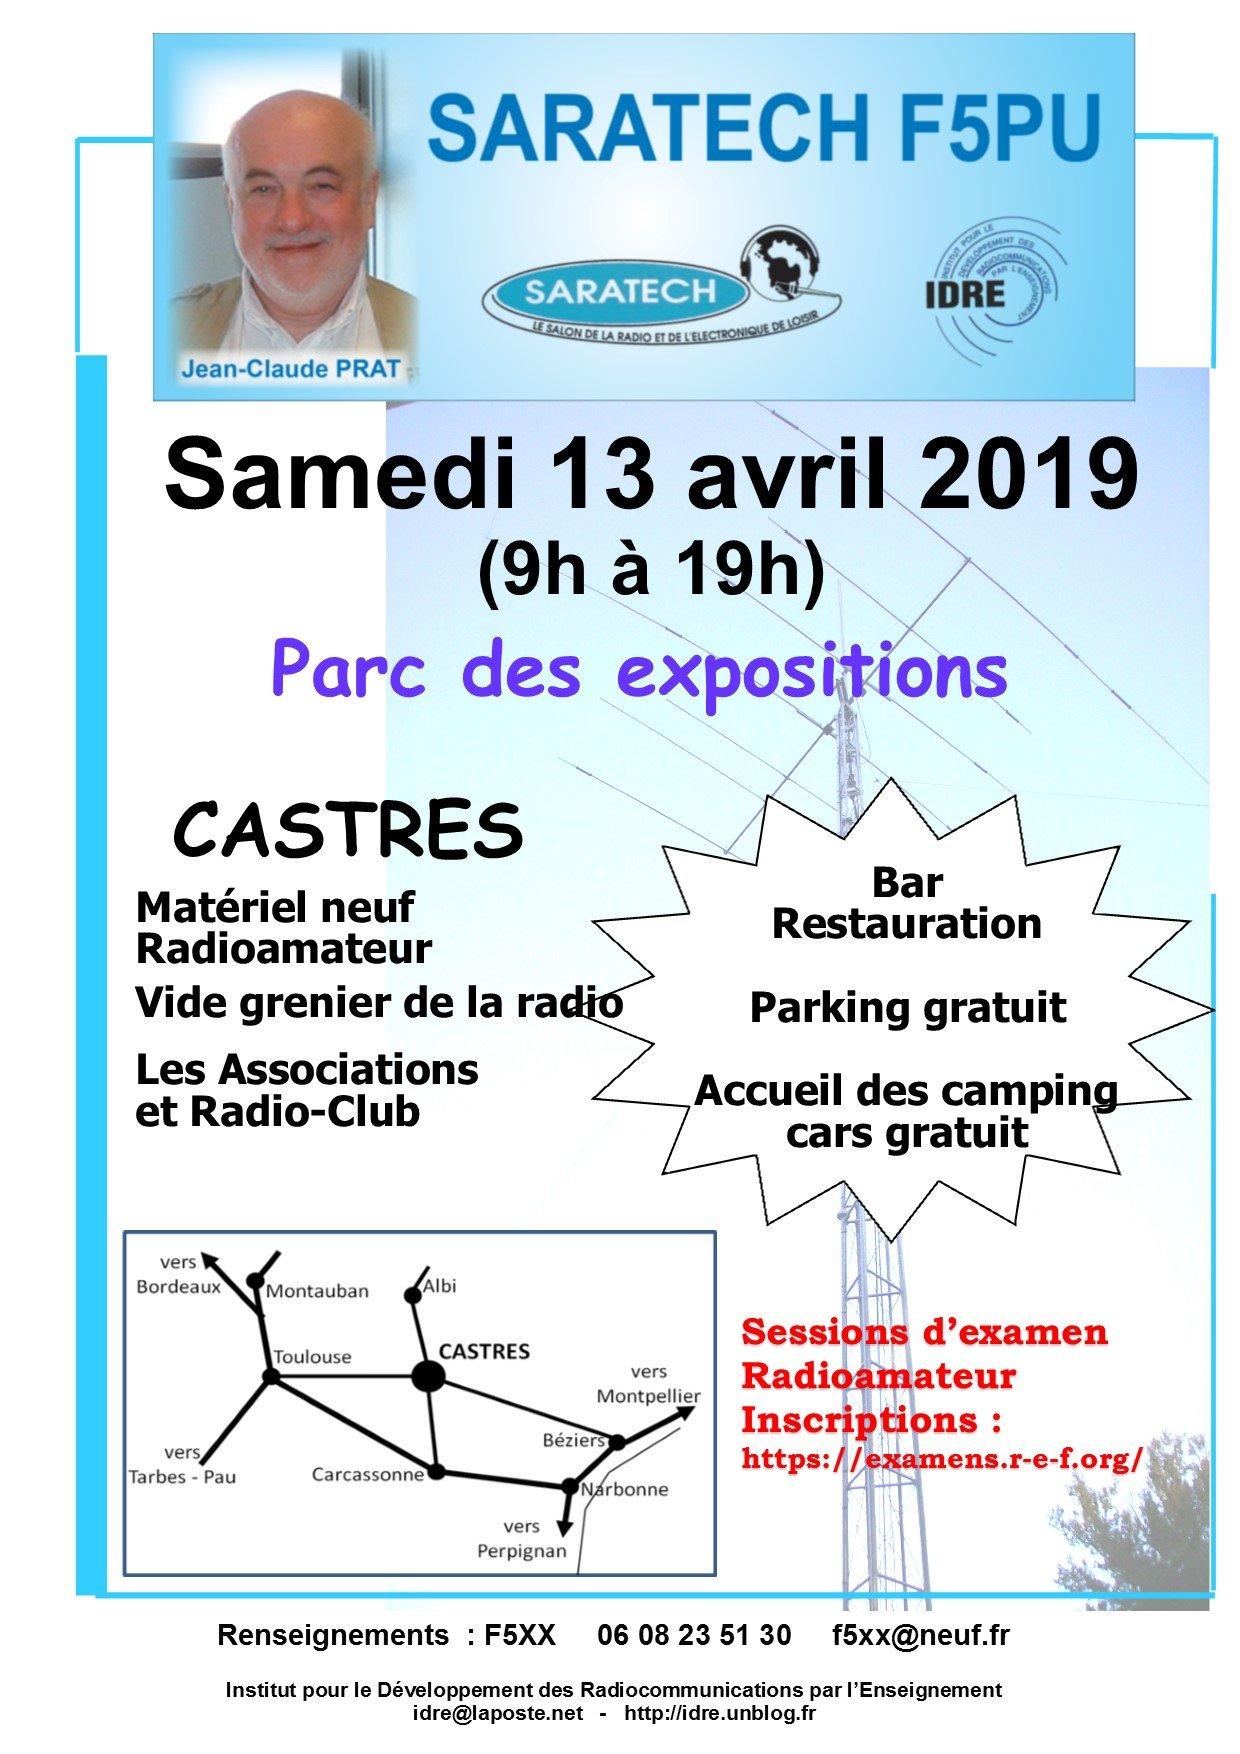 Le Salon Saratech saratech-f5pu-2019_affiche2